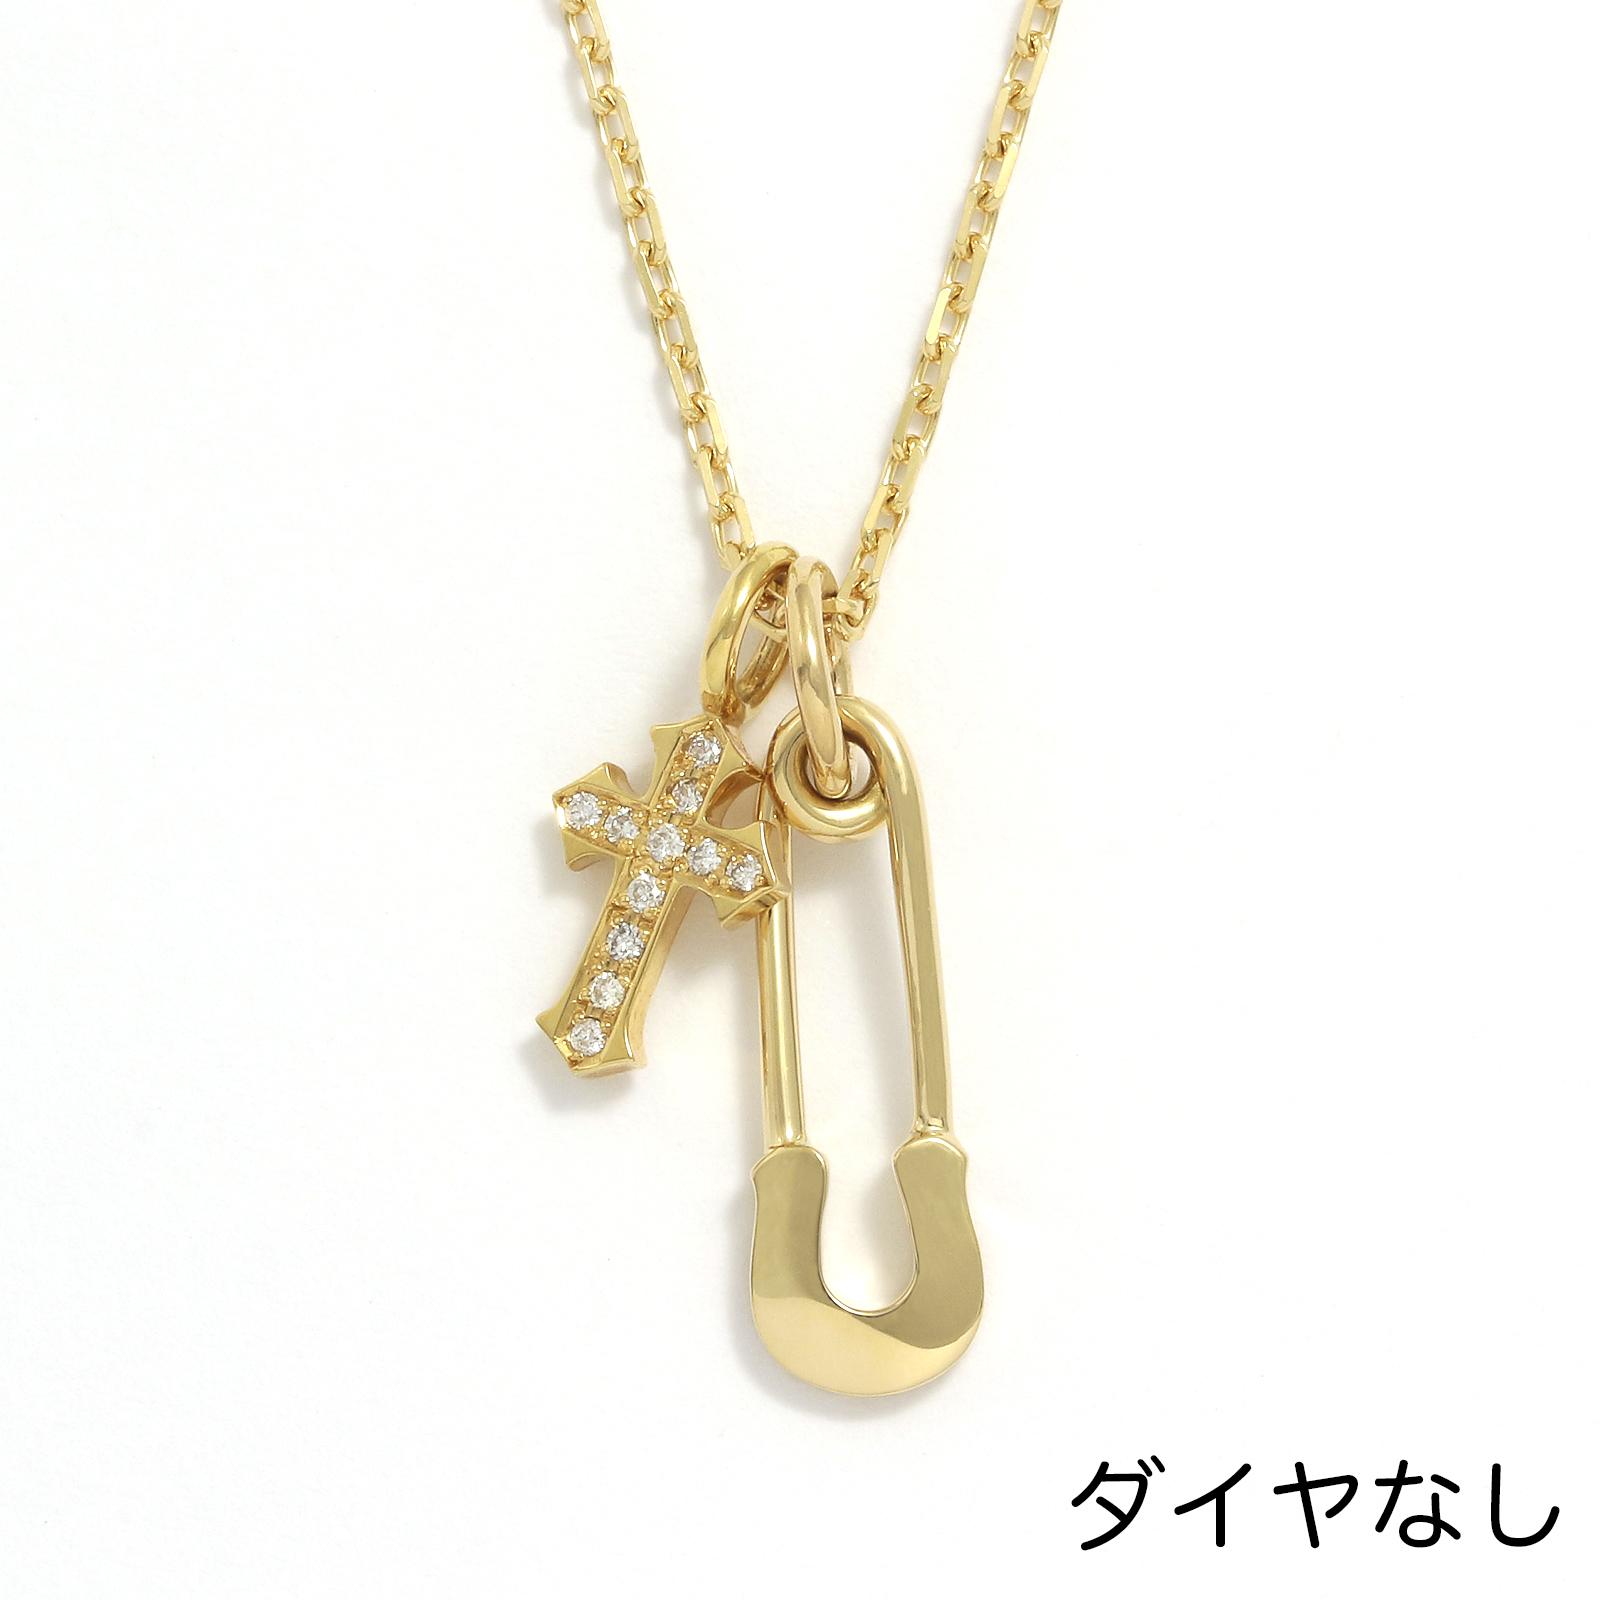 Safety Pin Charm + Little Cross Charm - K18Yellow Gold w/Diamond Set Necklace